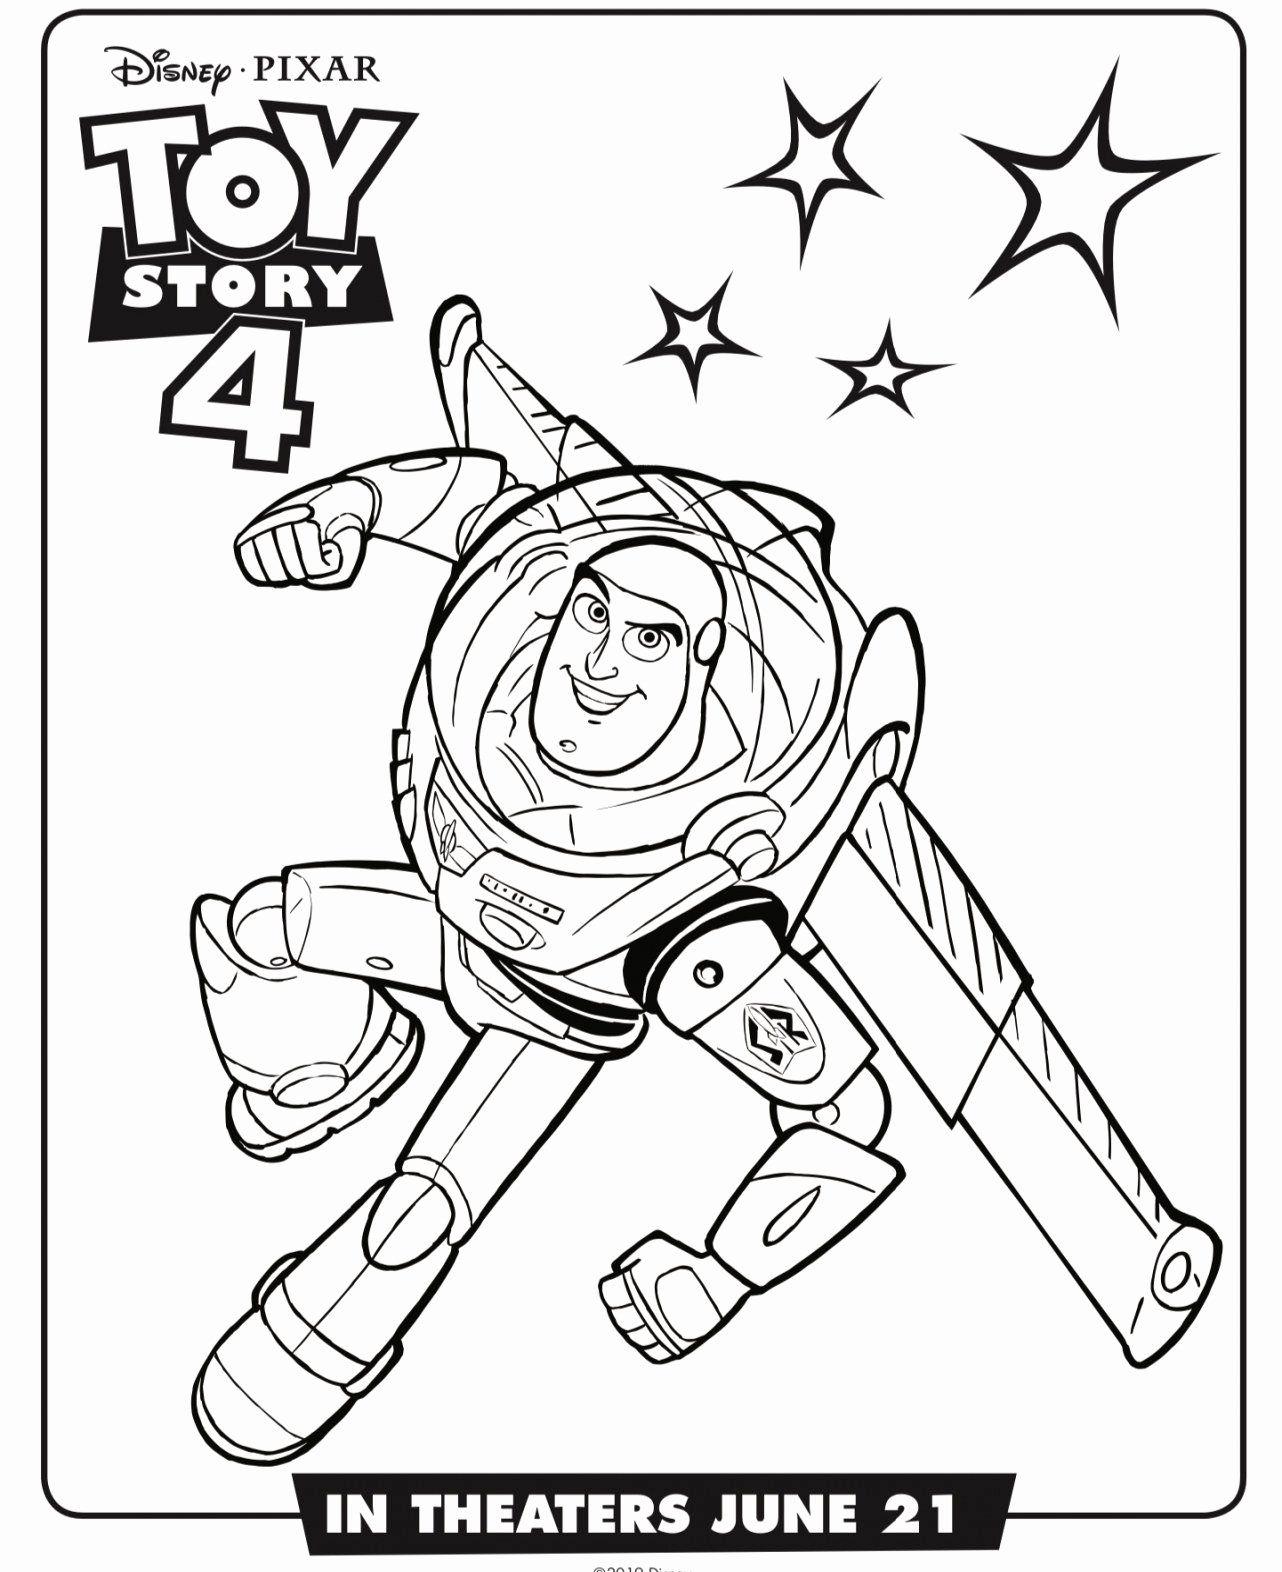 Space Coloring Pages For Preschoolers Elegant Coloring Pages Lol Dead Space Coloring Pages Best I 2020 Maleboger Disney Cars Disney